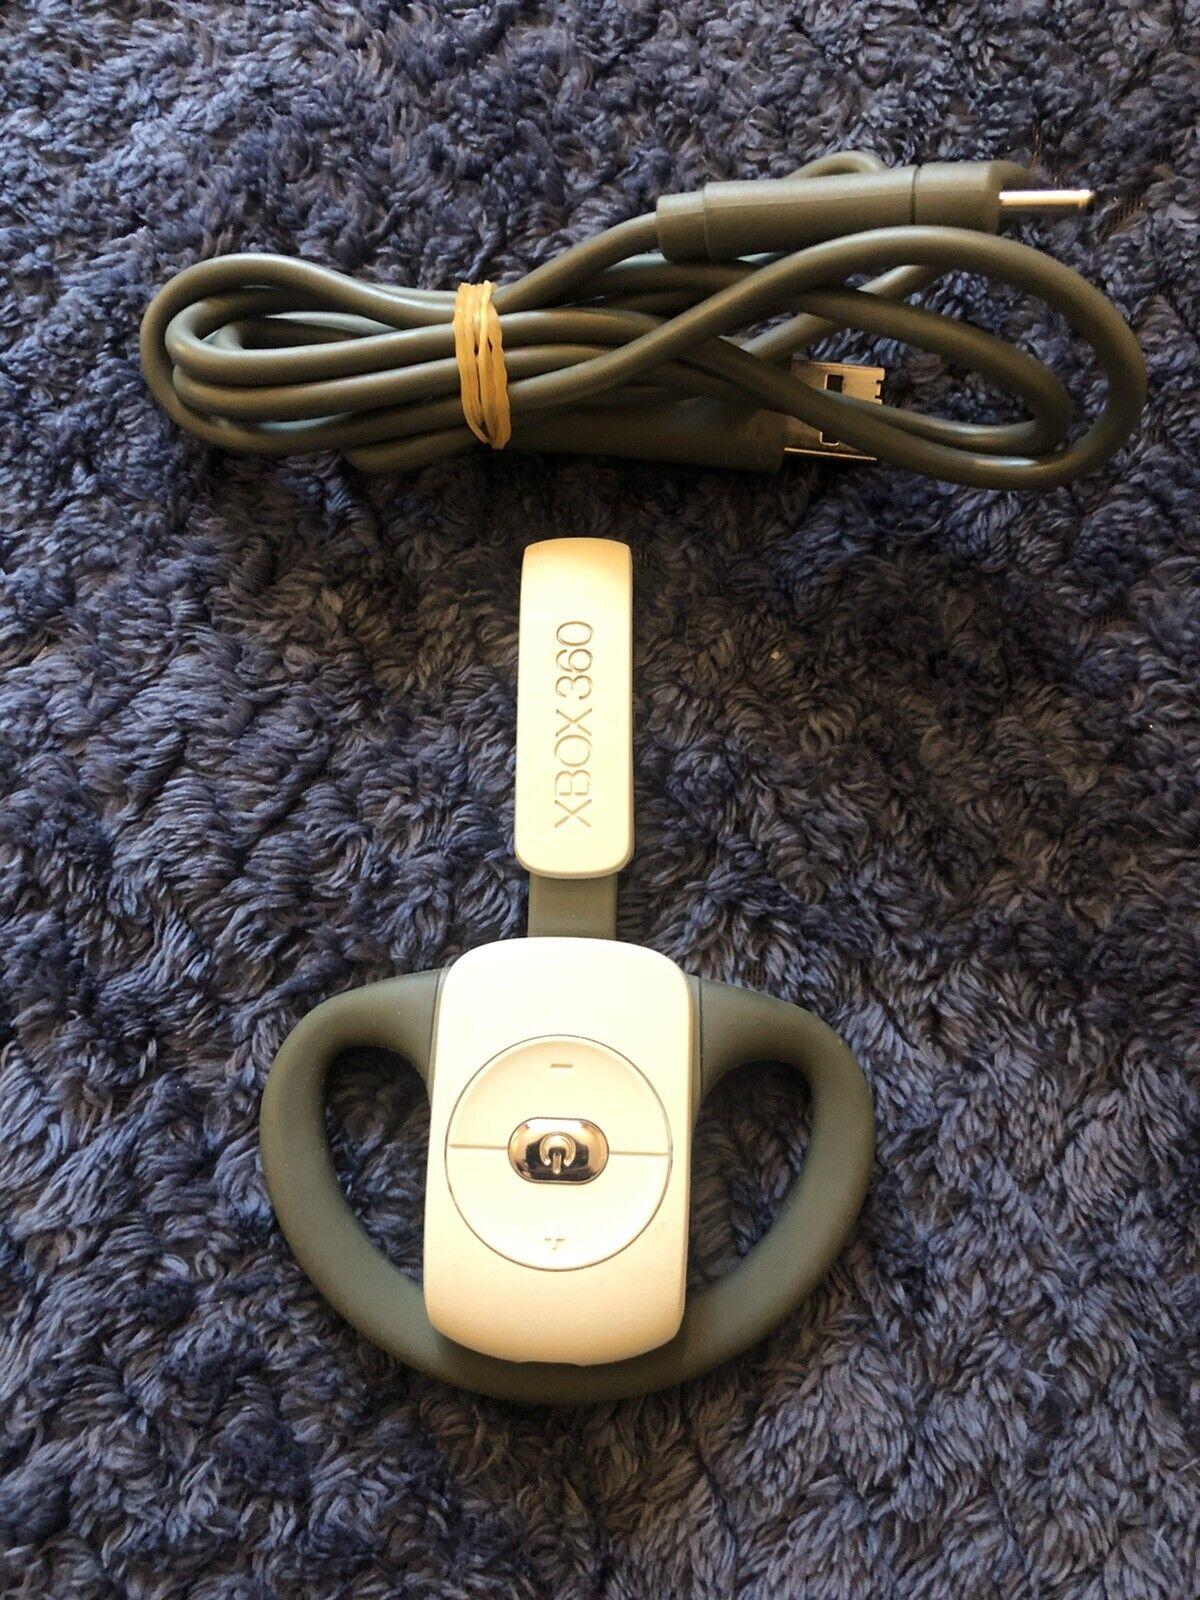 Genuine Microsoft Xbox 360 Wireless White Chat Headset Earpiece Mic